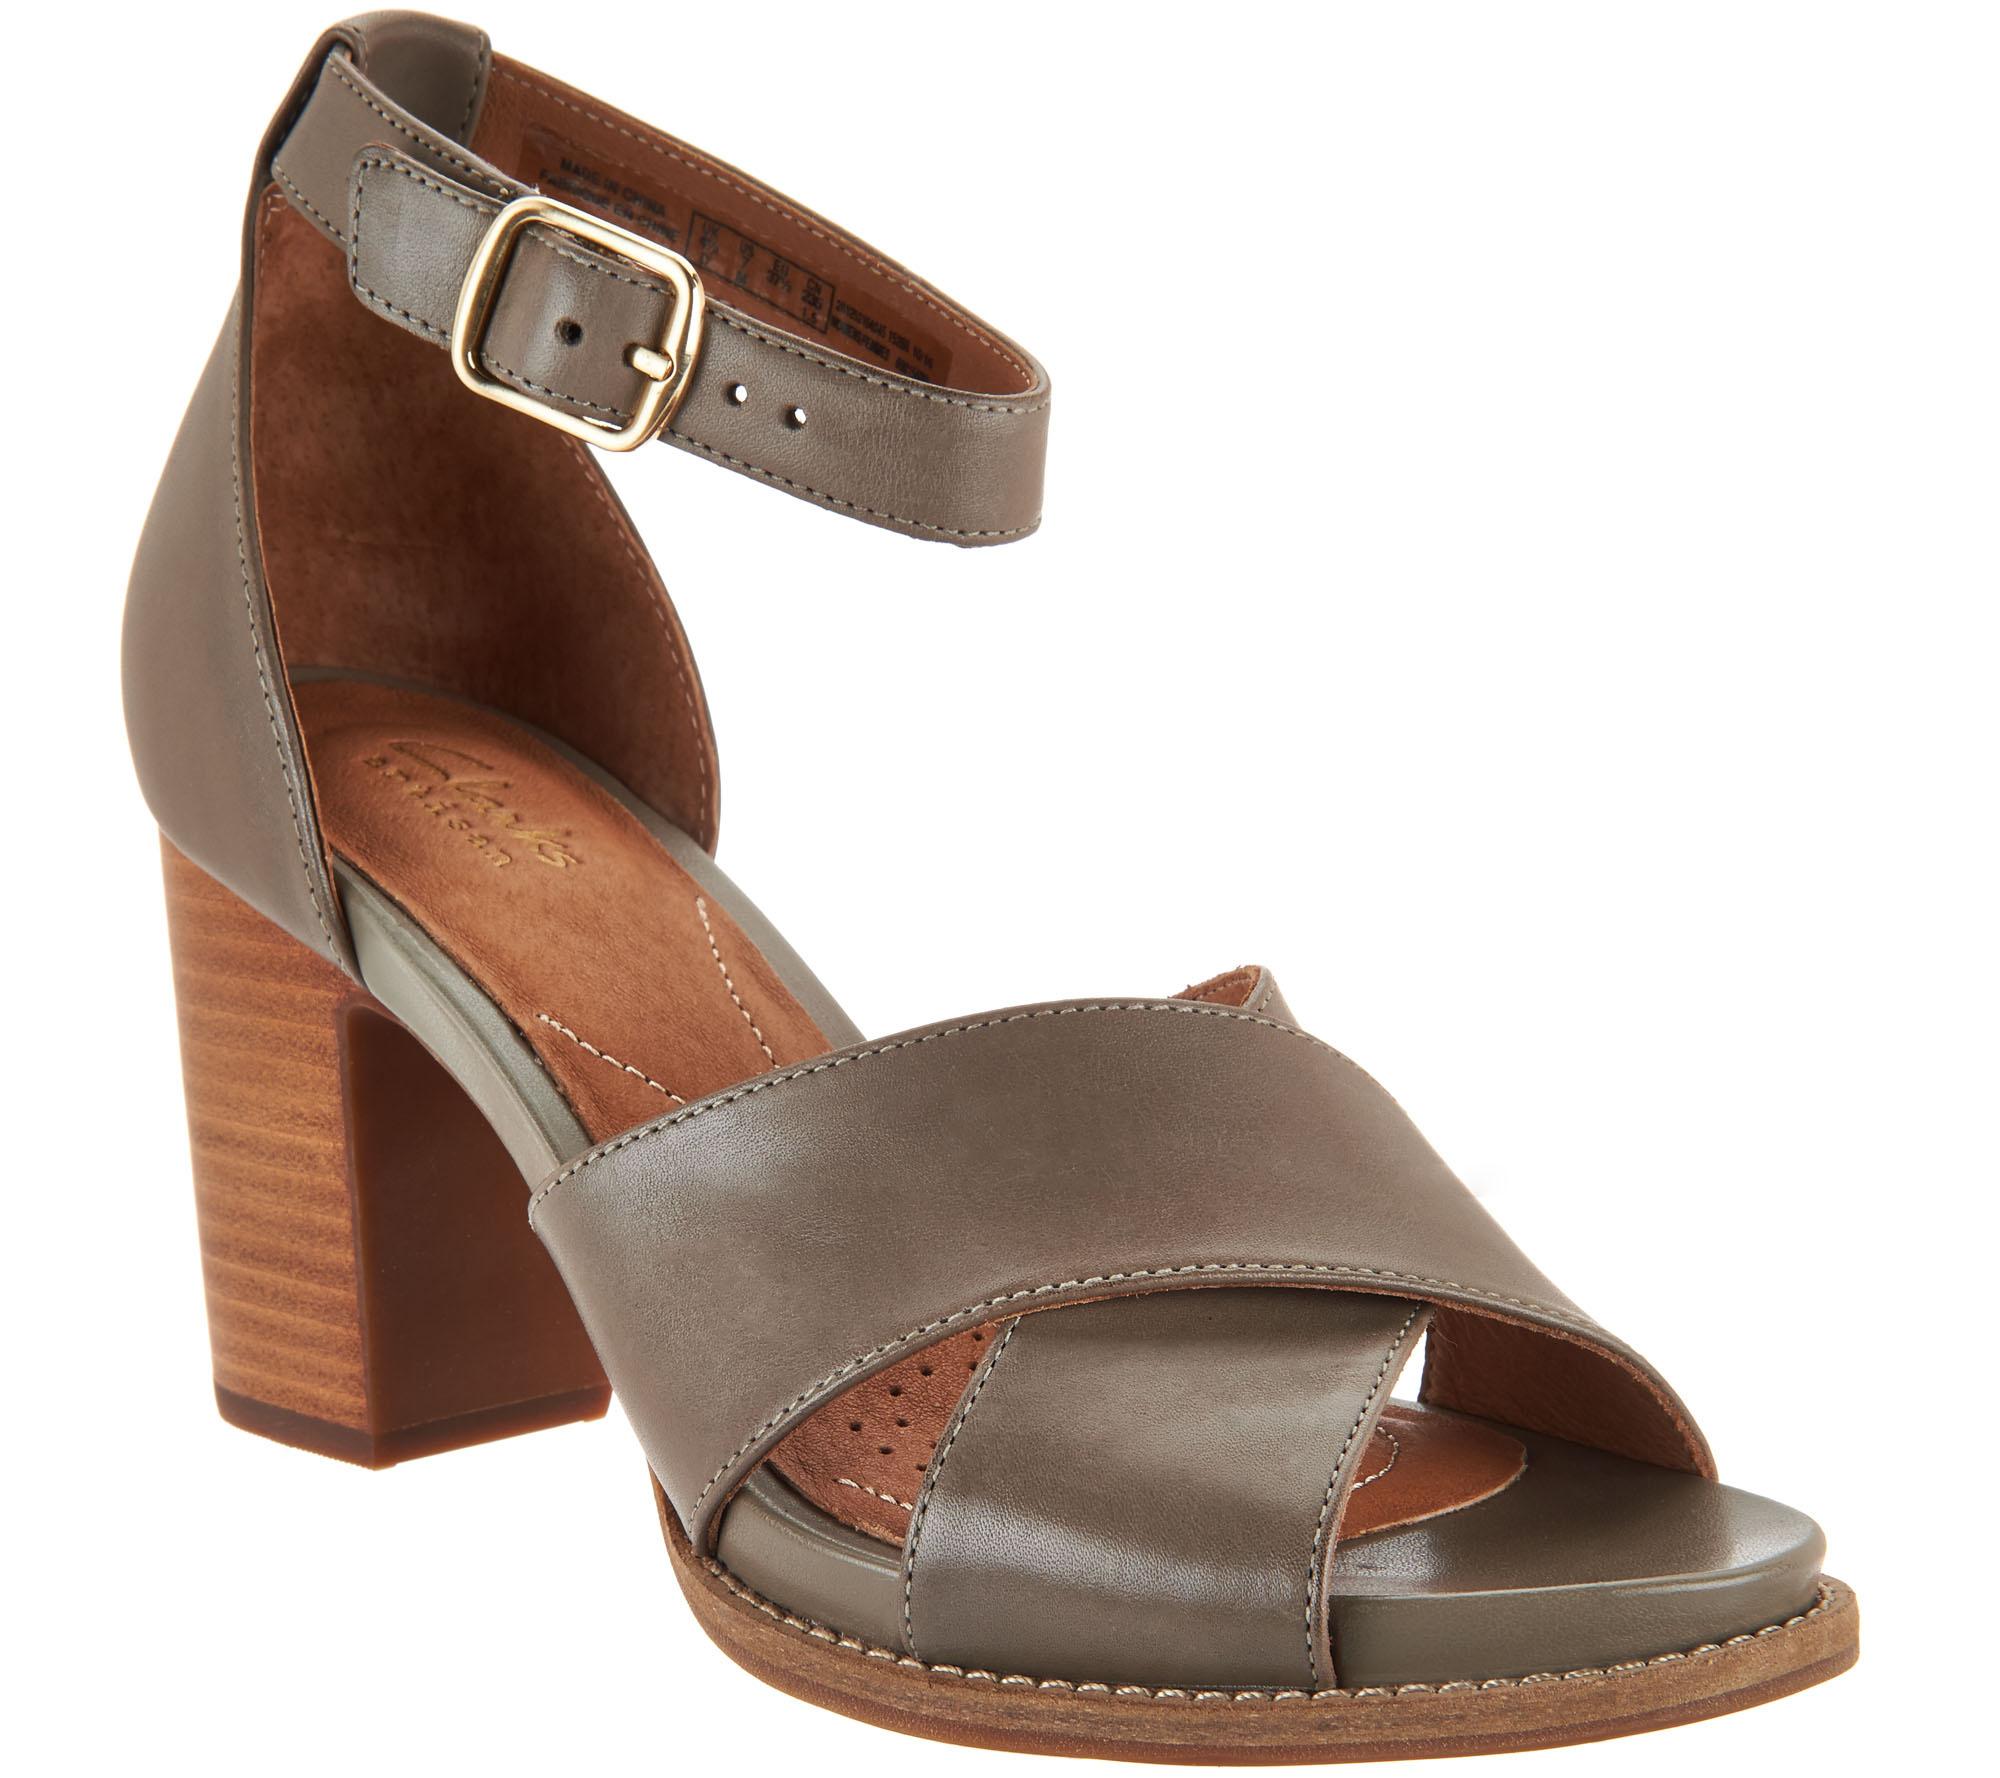 Clarks Artisan Leather Block Heel Sandals - Briatta Tempo